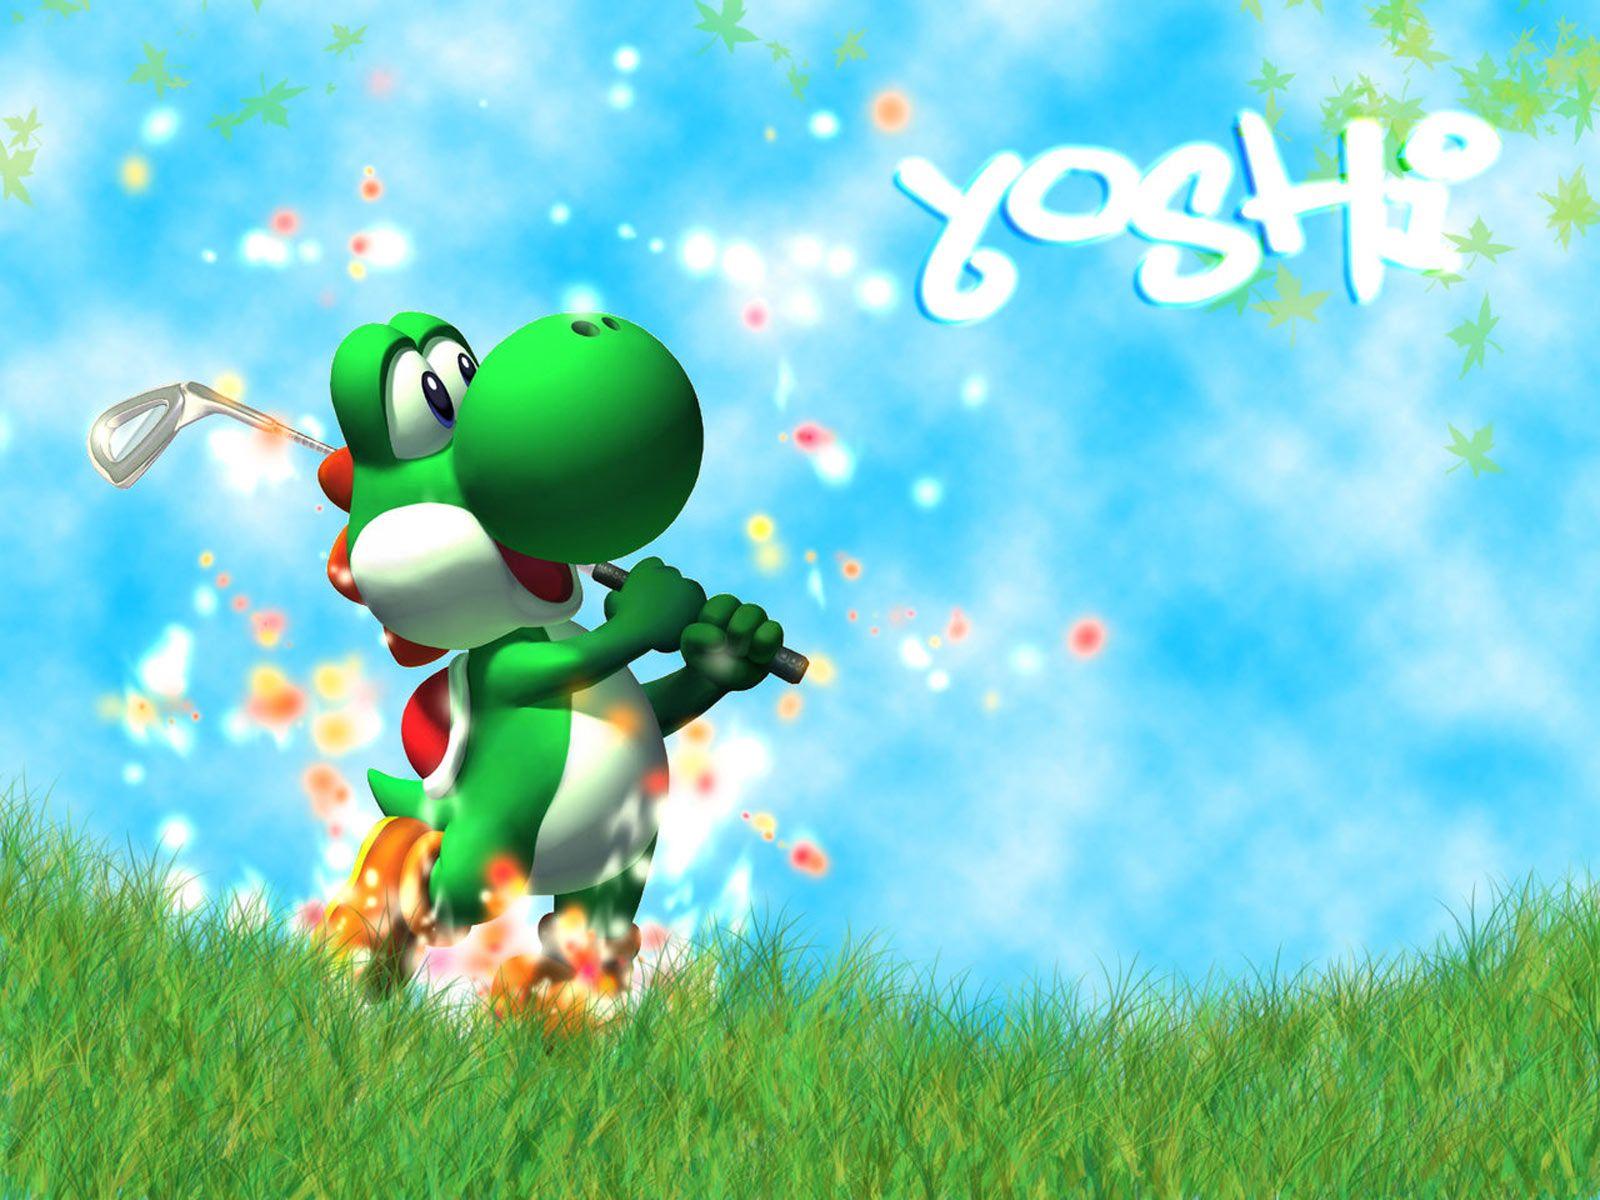 Yoshi Playing Golf, golf, nintendo video games, sports